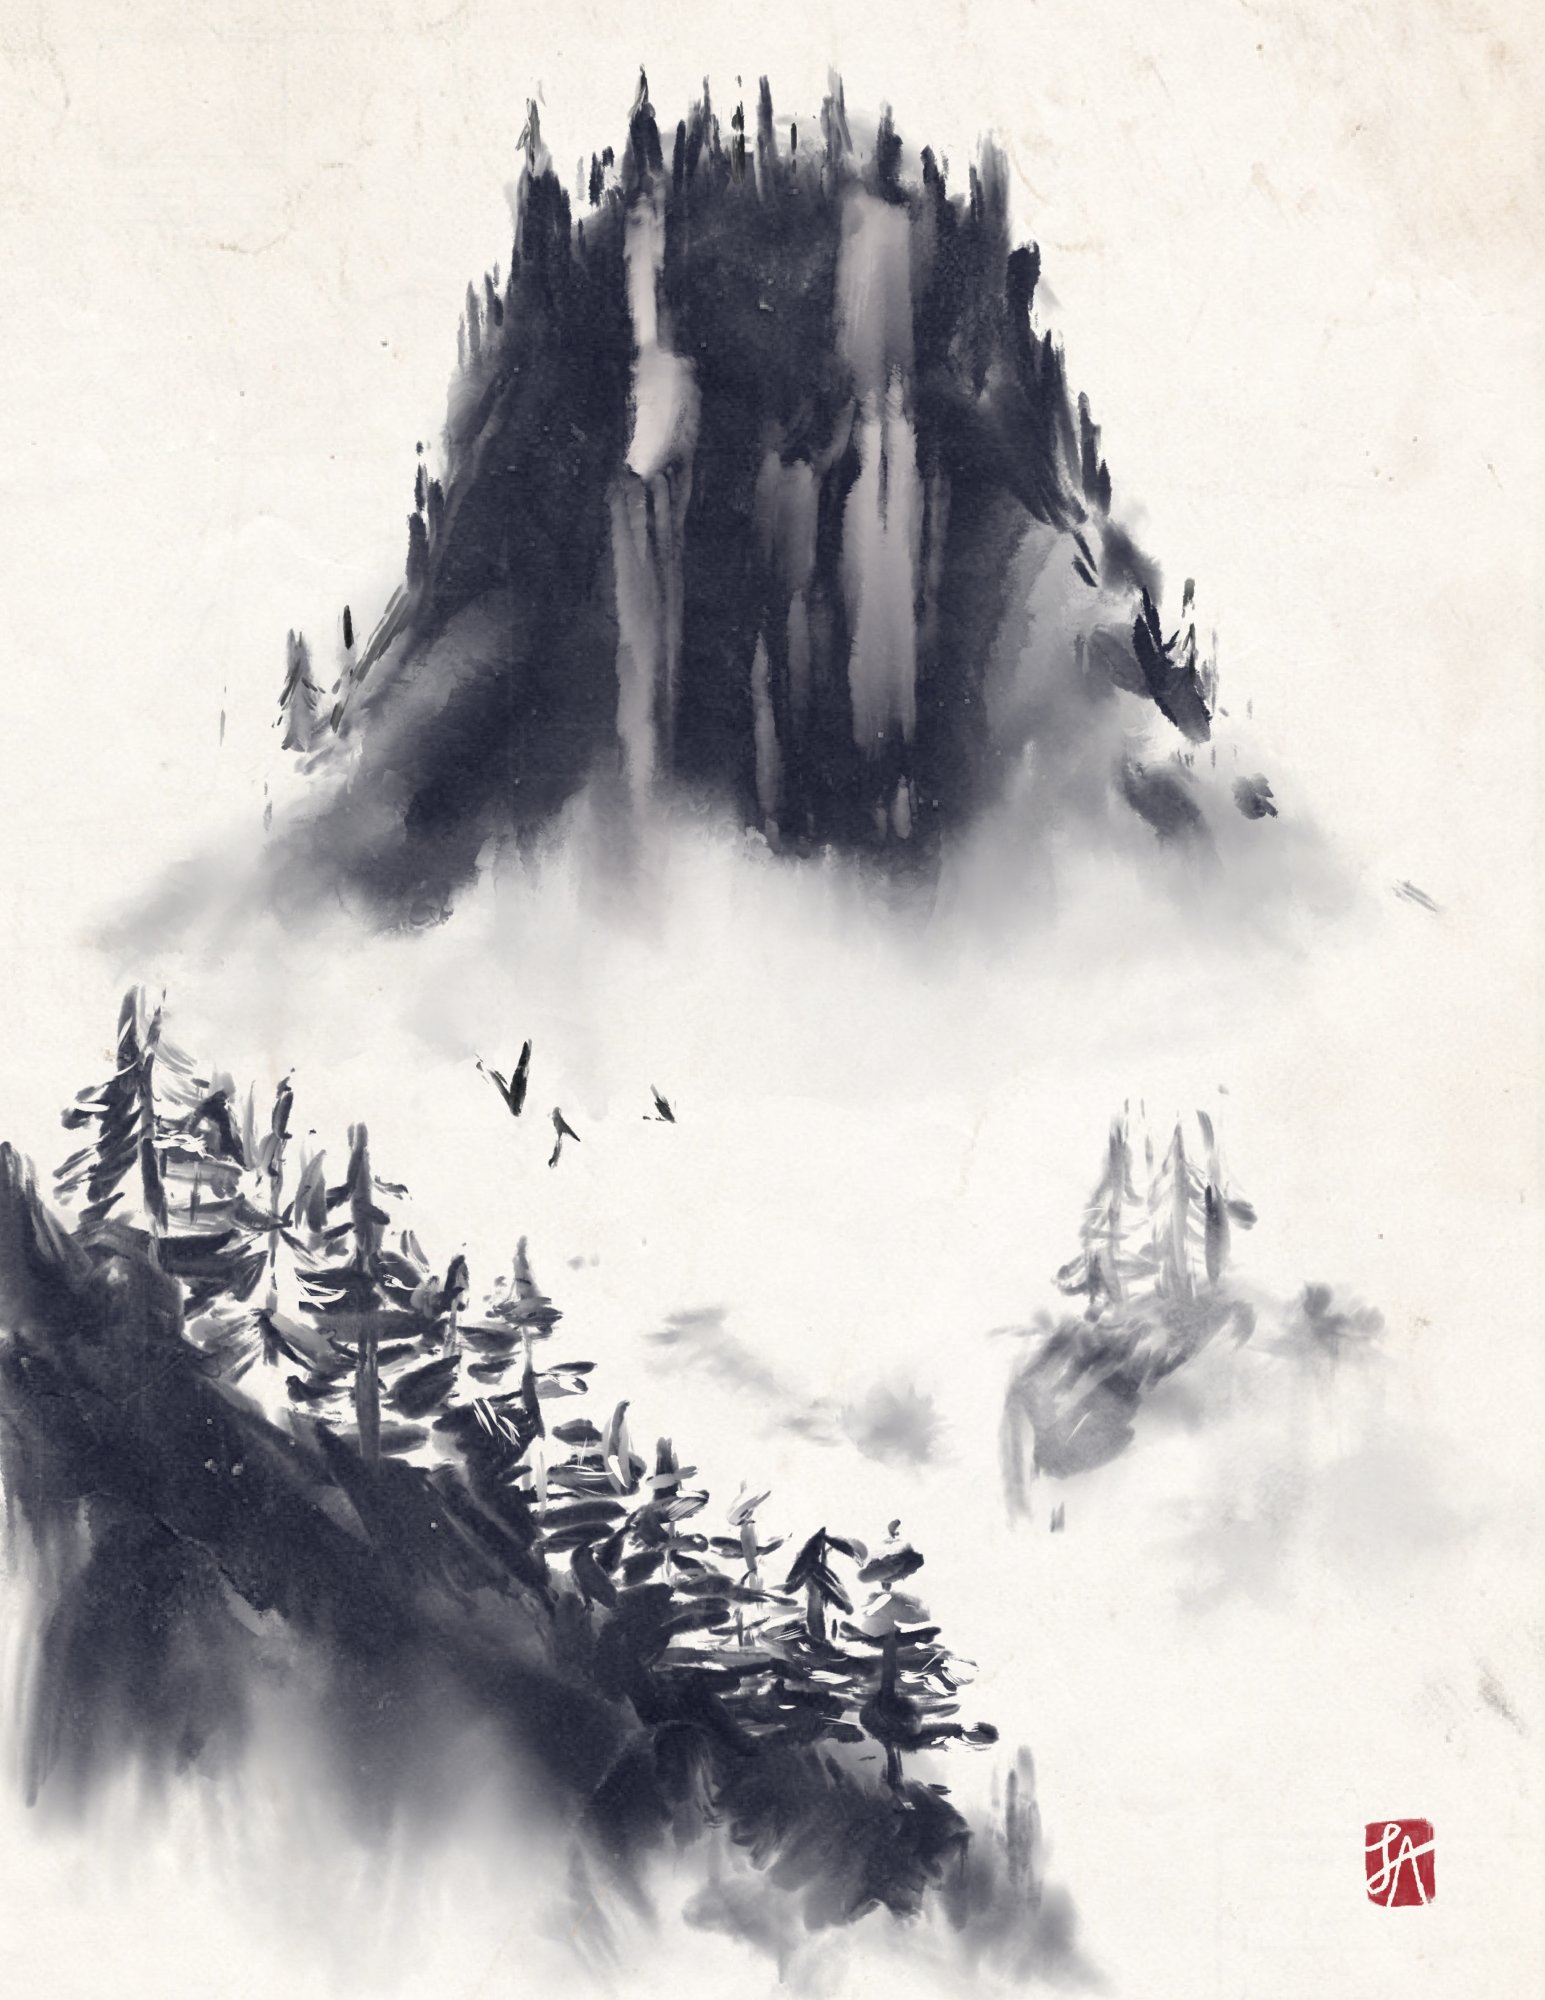 Procreate Samurai Inks Brush Pack Sumi e Mountain